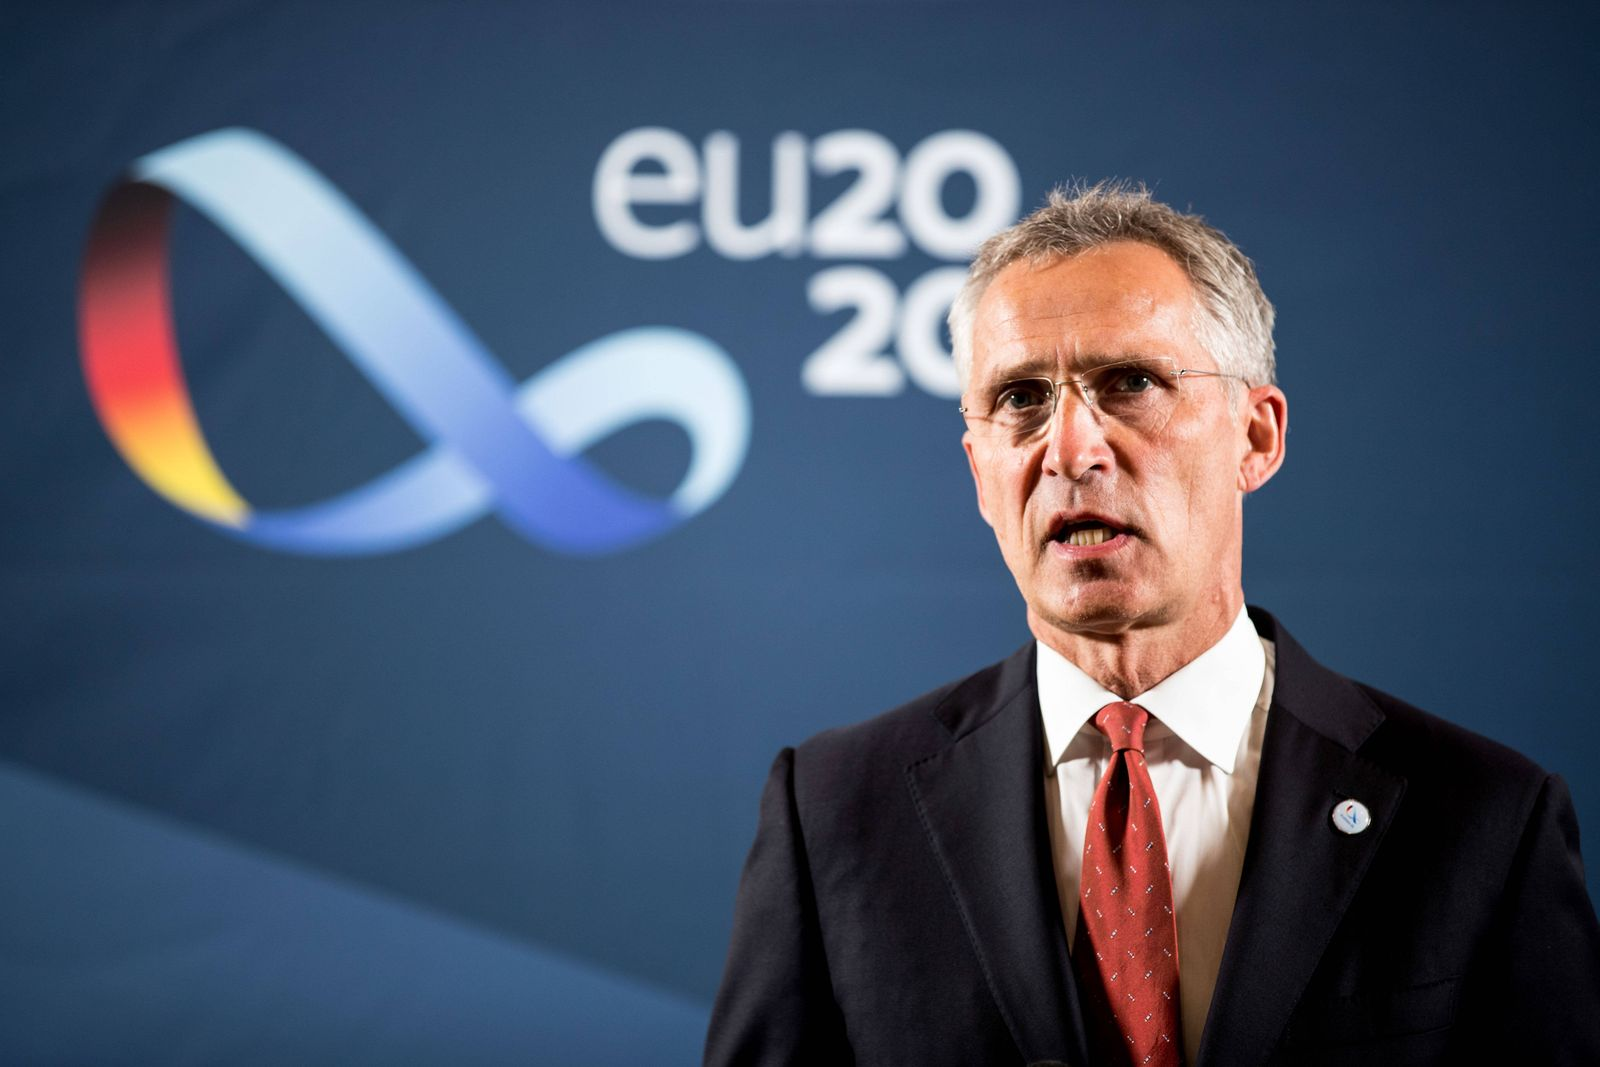 (200827) -- BERLIN, Aug. 27, 2020 -- The North Atlantic Treaty Organization (NATO) Secretary General Jens Stoltenberg d